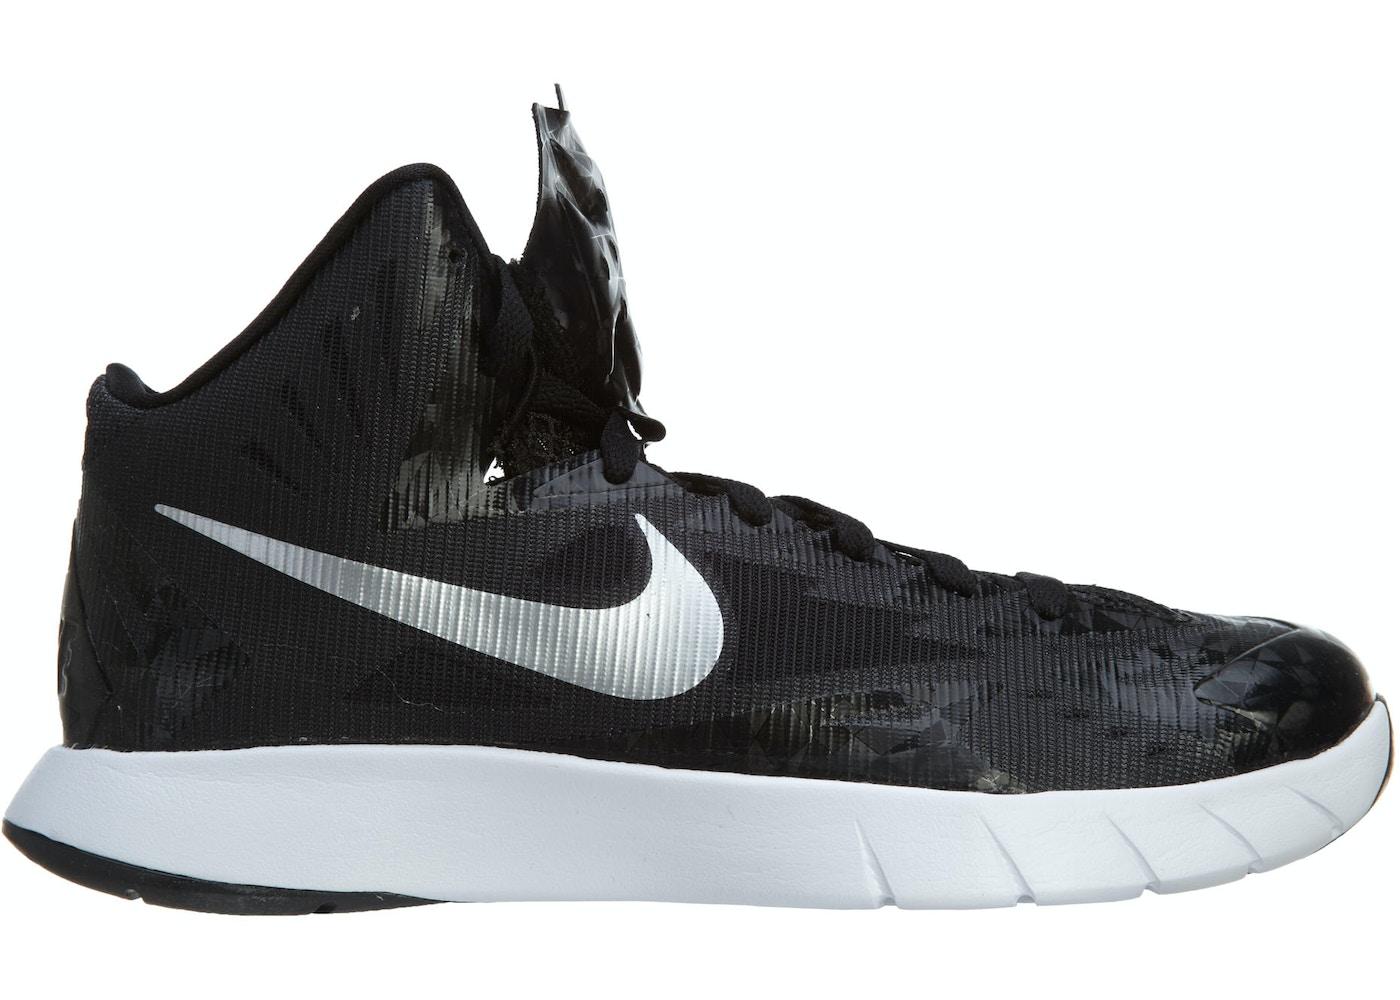 Nike Lunar Hyperquickness Tb Black Metallic Silver-White - 652775-001 eadd05458